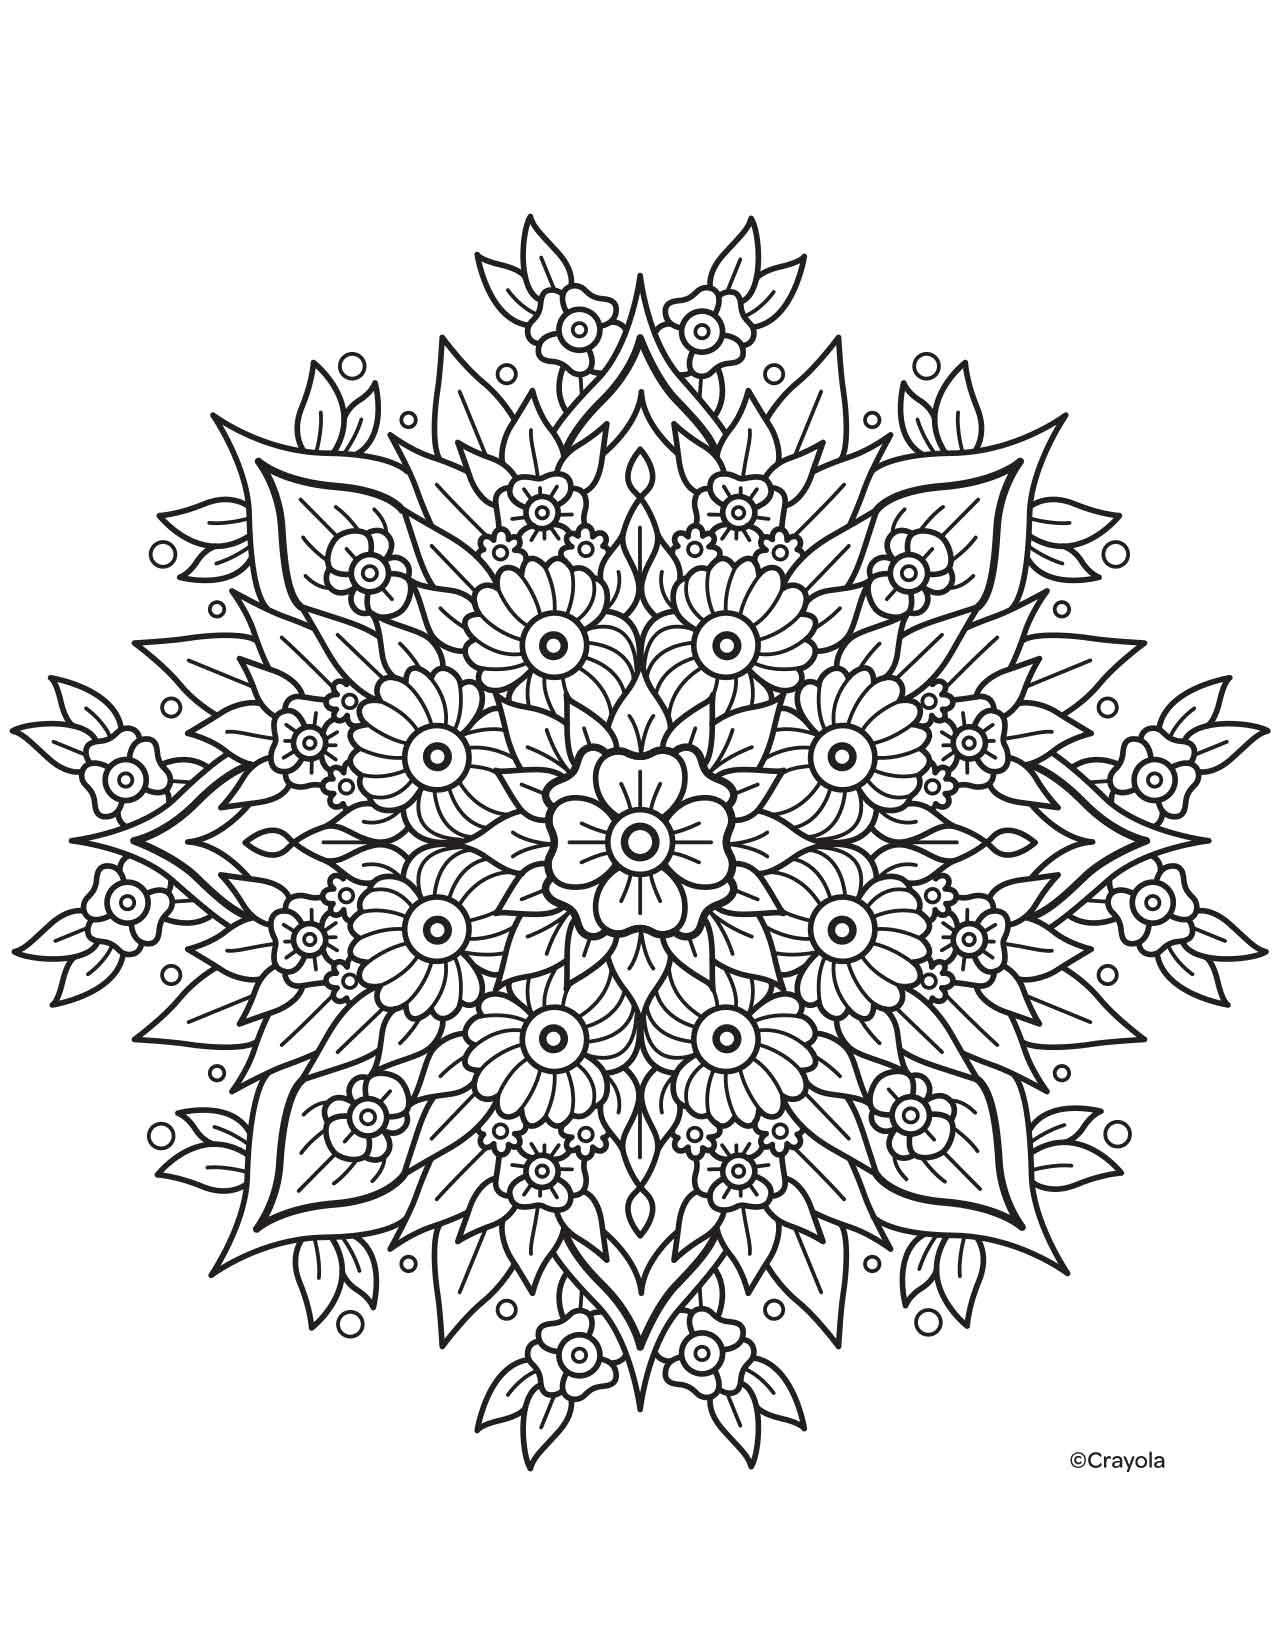 Flower Mandala Crayola.com